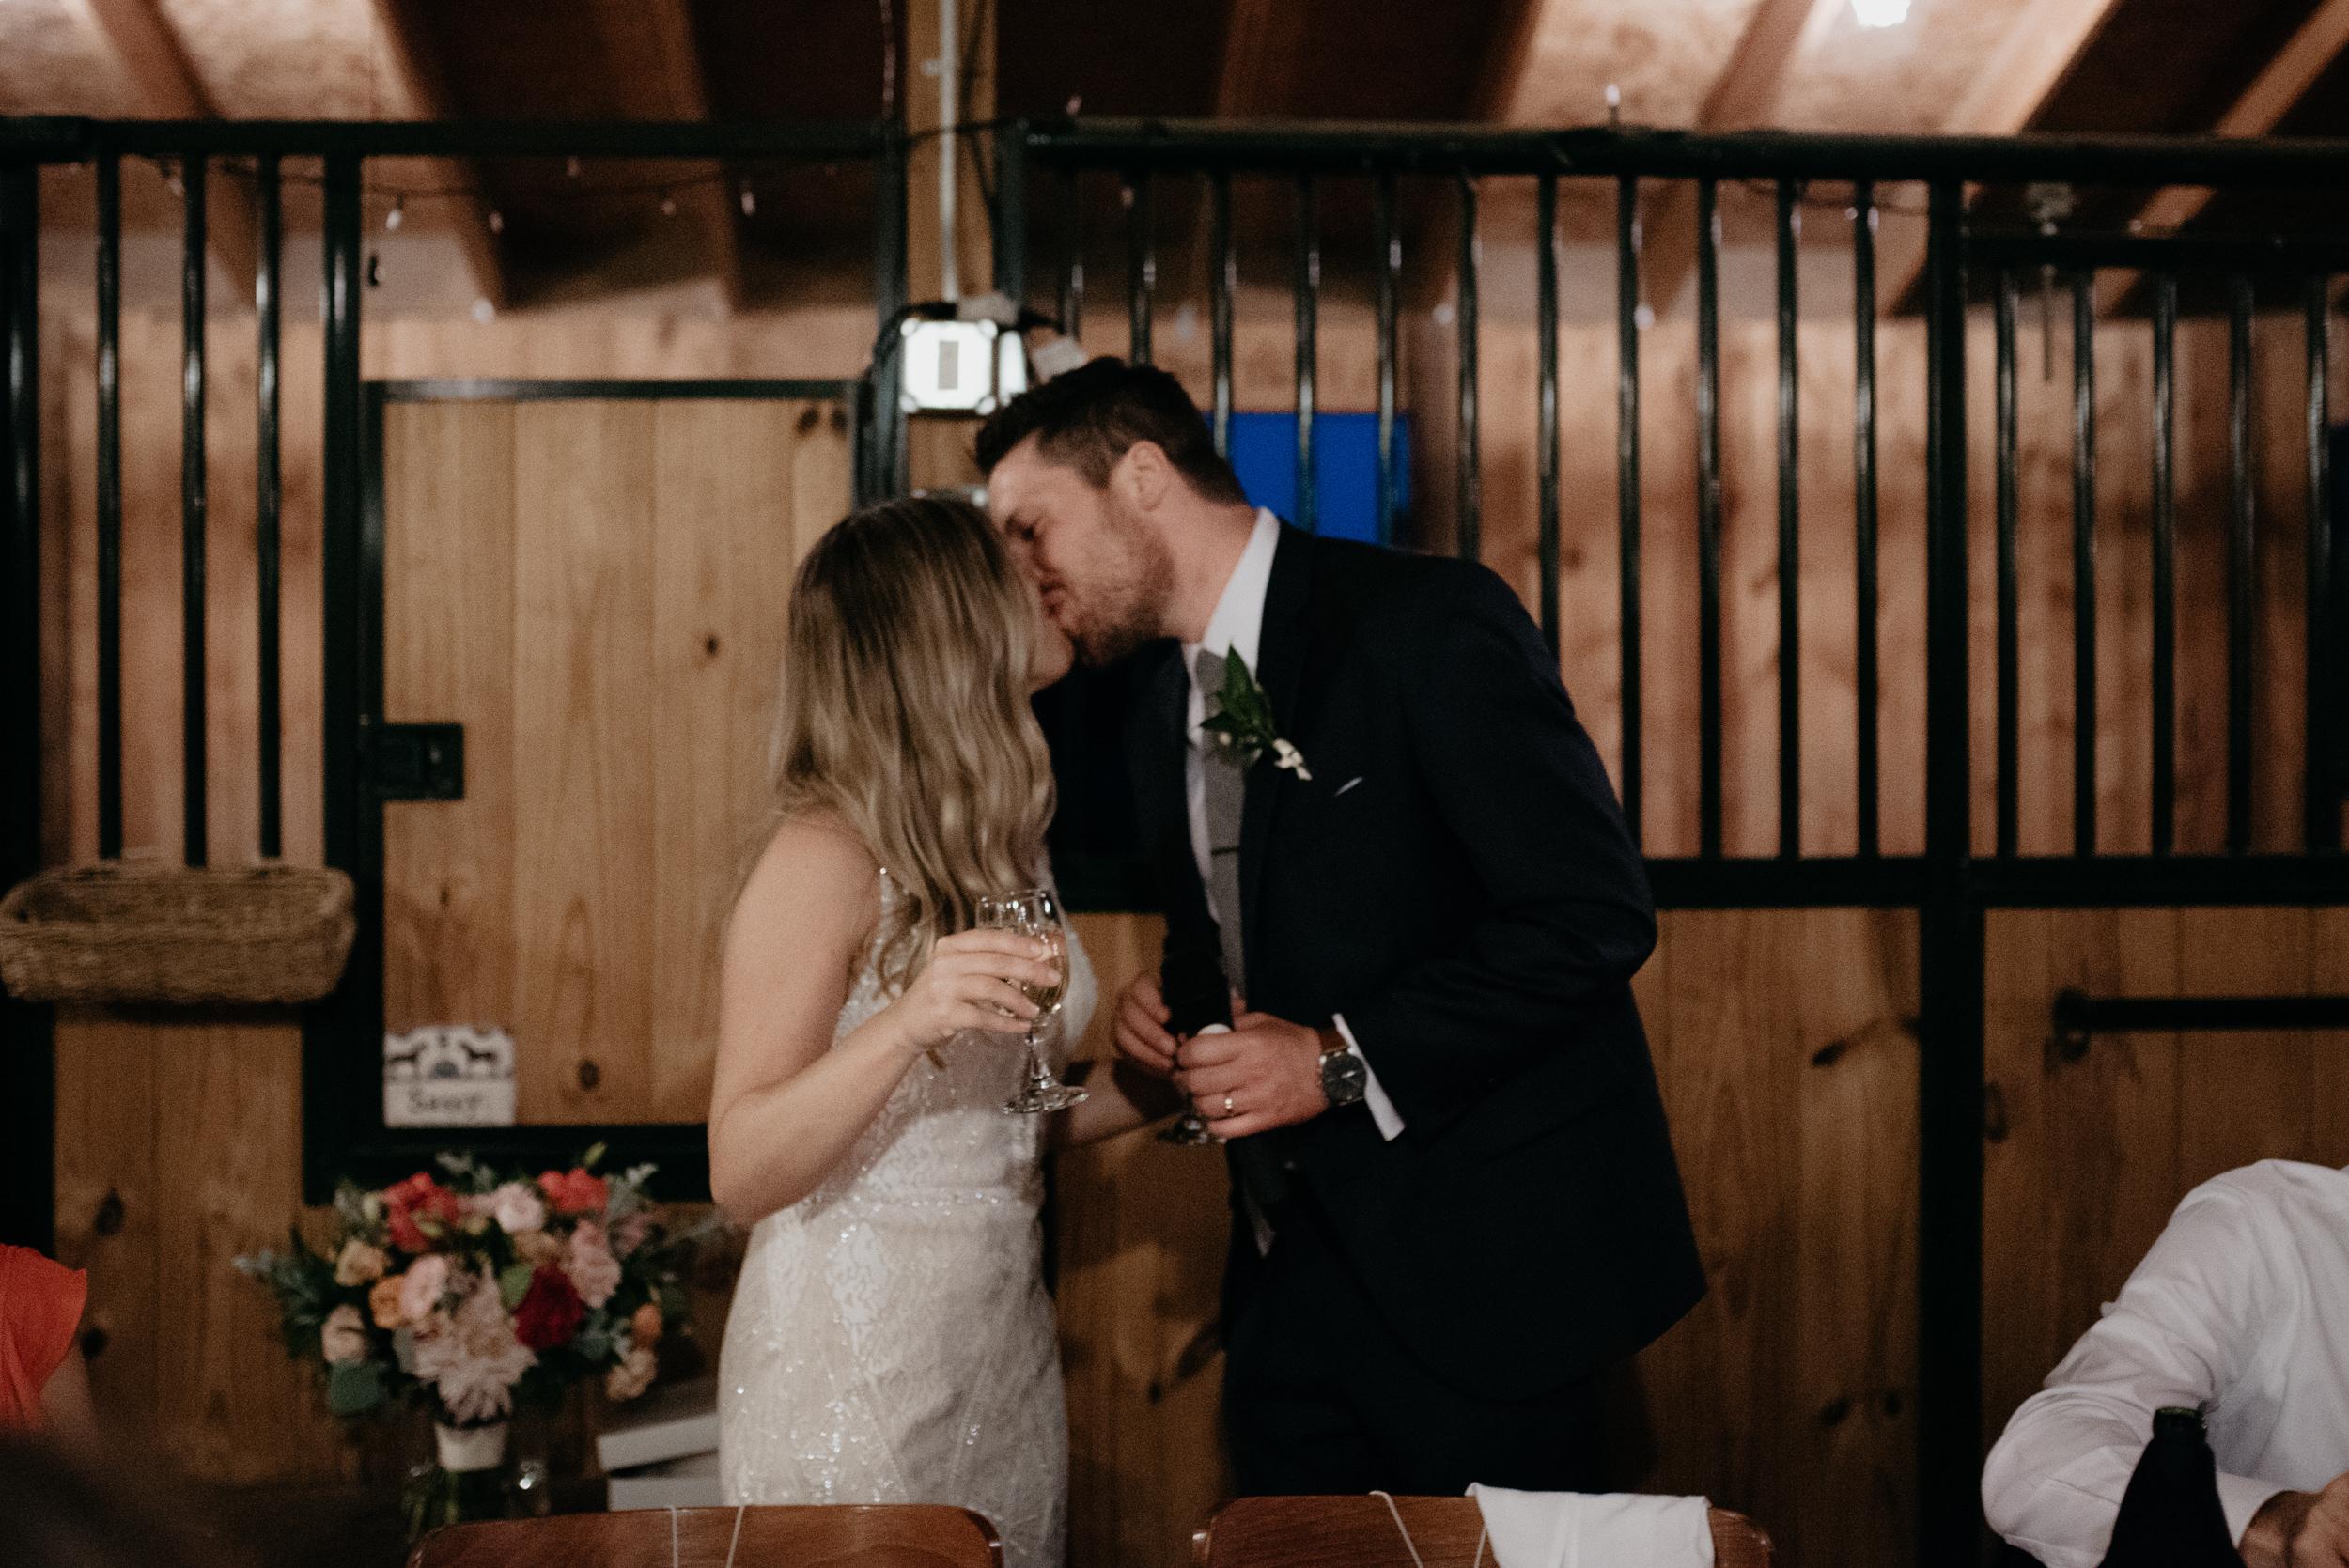 Speeches at a Three Leaf Farm Boulder wedding. Boulder, Colorado rustic wedding venue. Colorado elopement and wedding photographer.